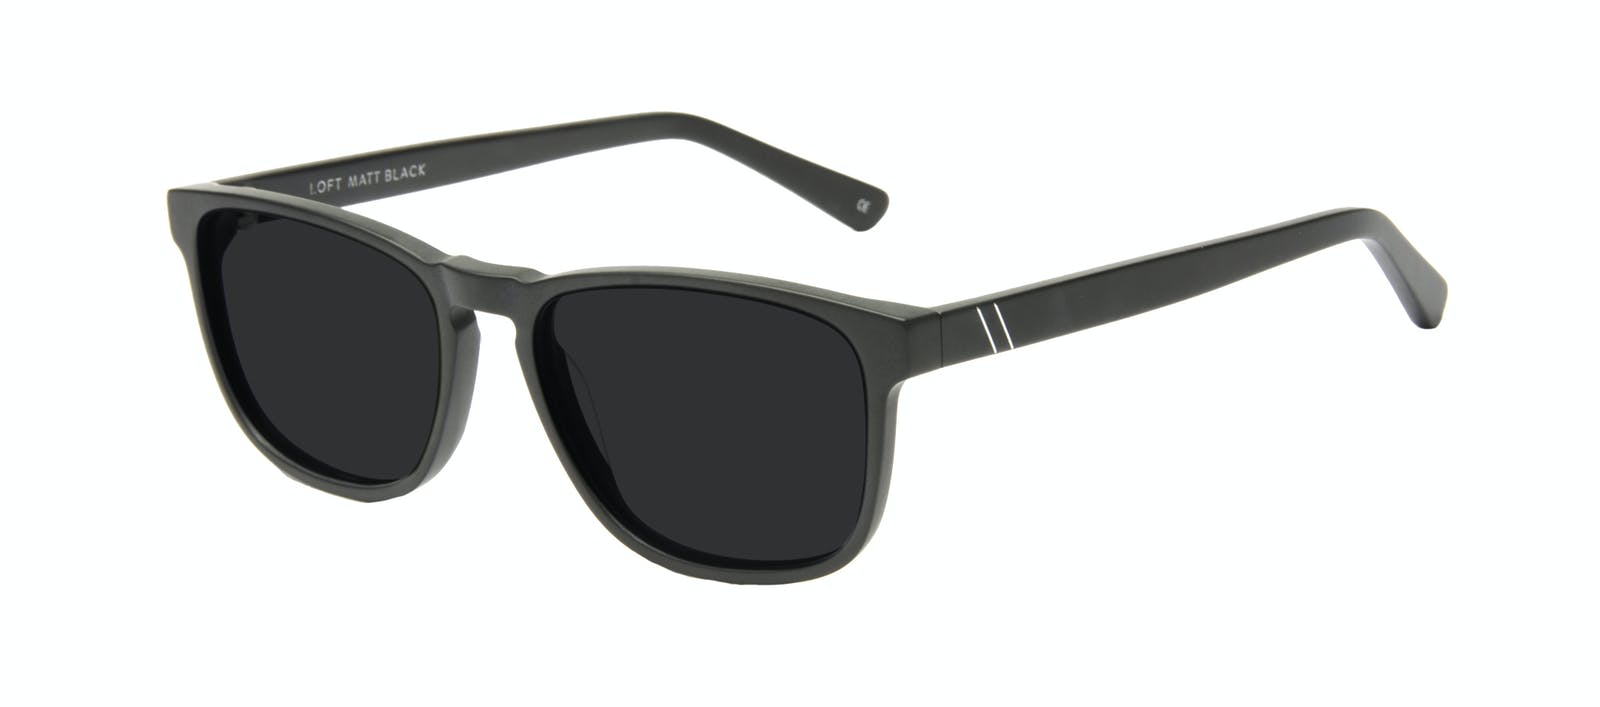 b85d8b467c2 Affordable Fashion Glasses Rectangle Sunglasses Men Loft Matte Black Tilt